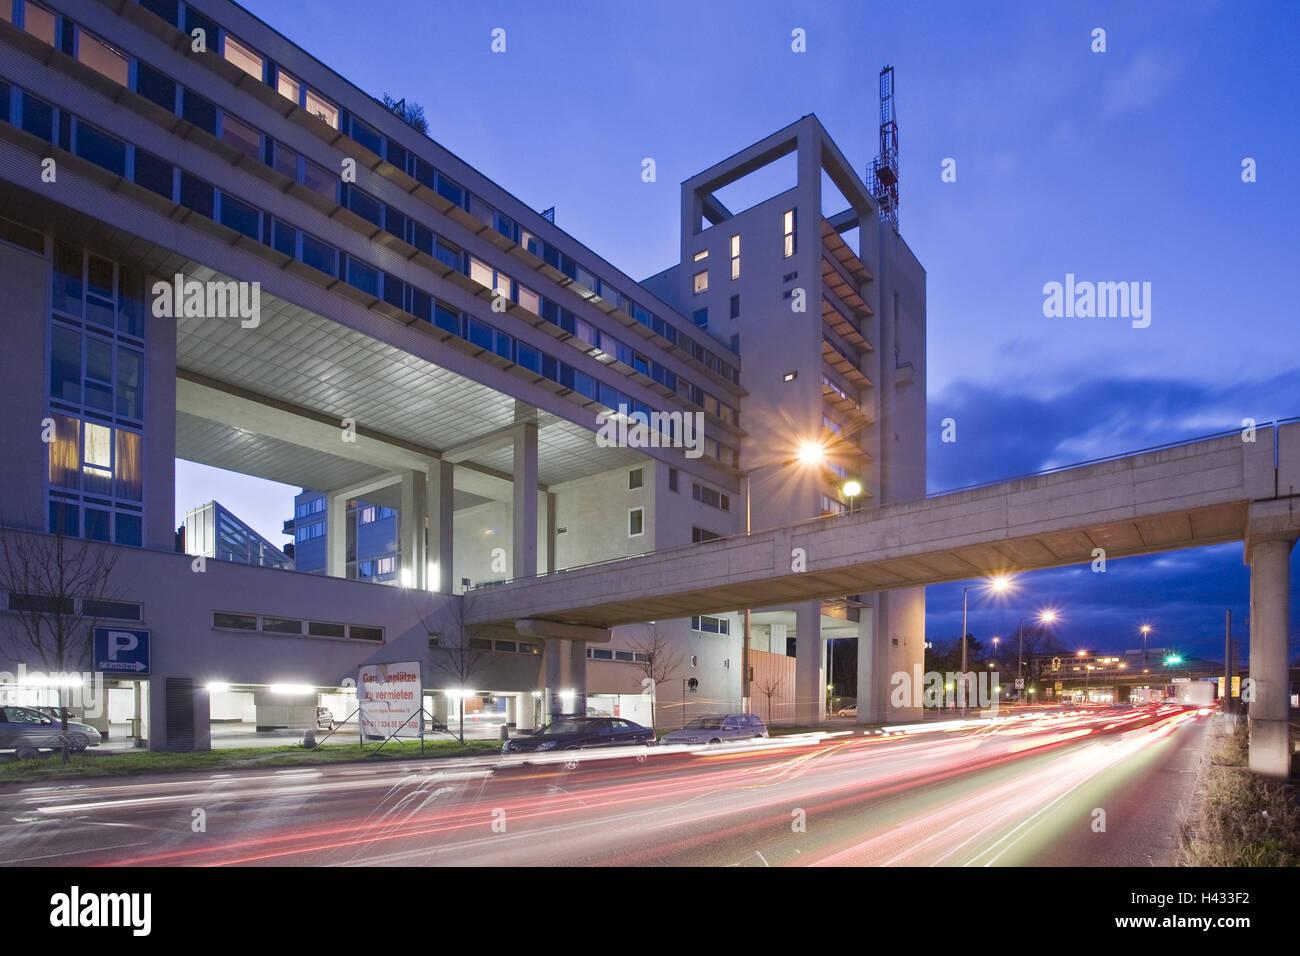 Austria, Vienna, commercial imitation leather, building, street, light tracks, night, - Stock Image